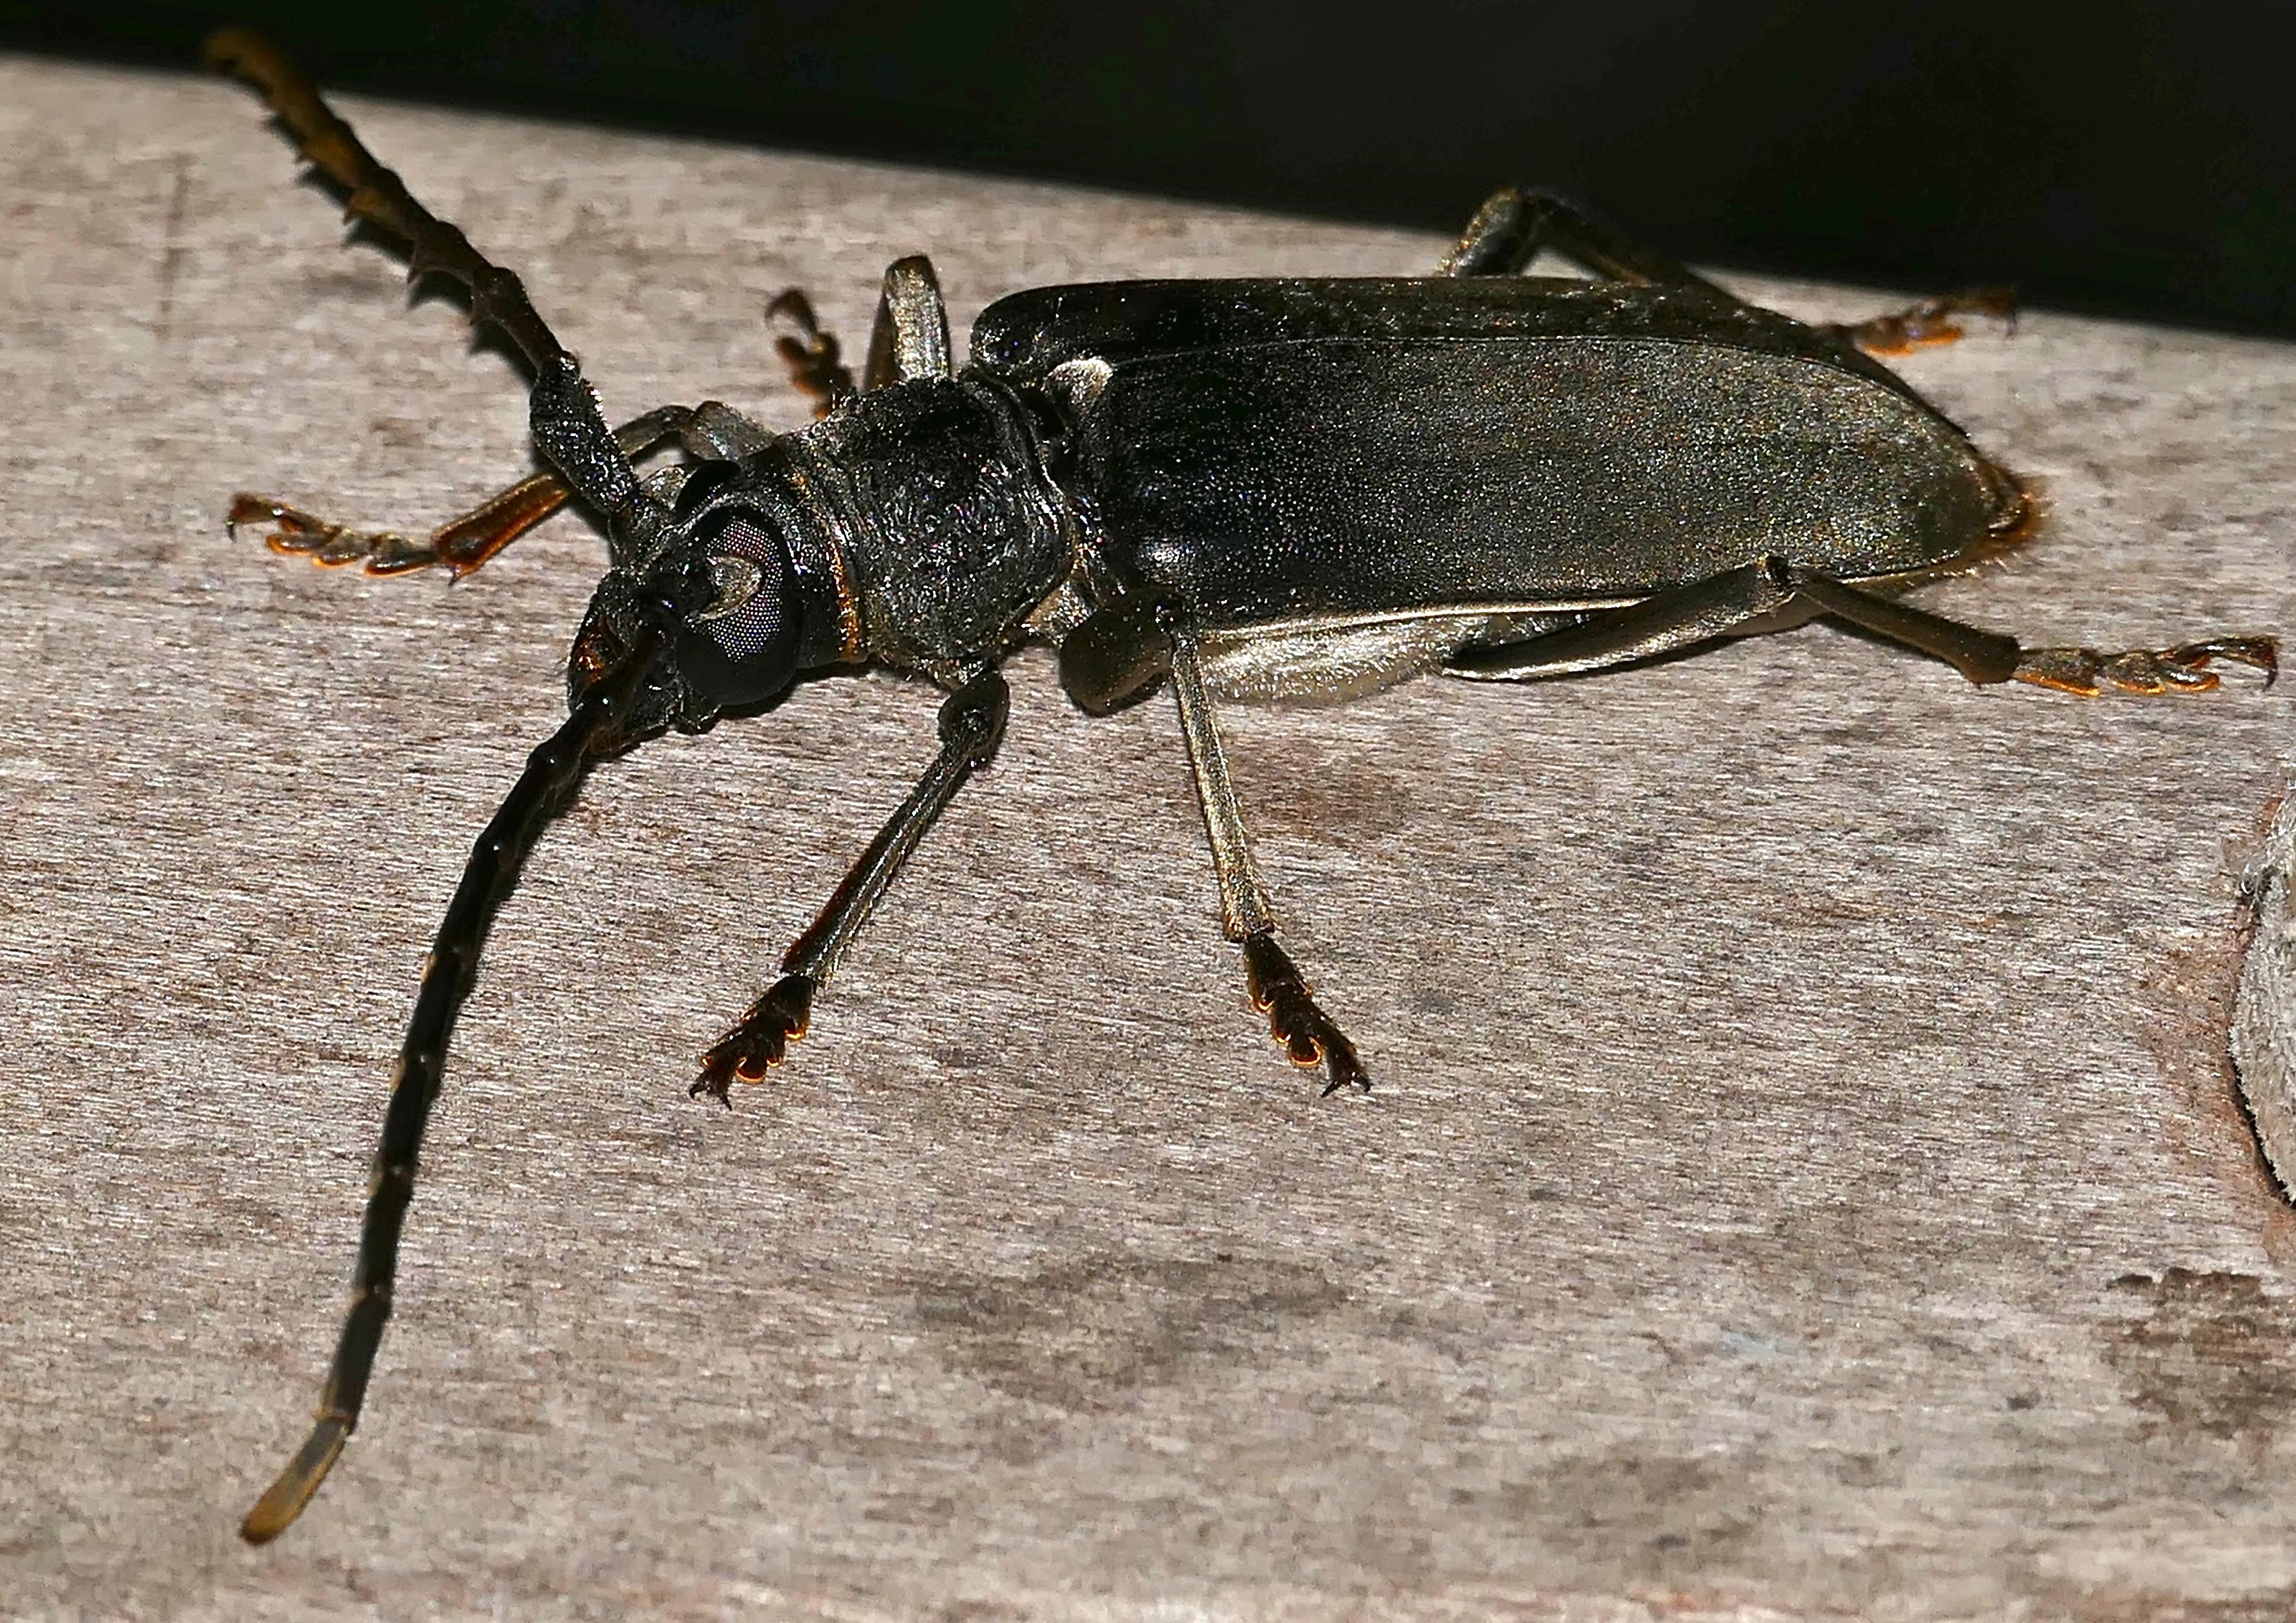 Sawtooth-antenna_Longhorn_Beetle_%28Neoplocaederus_granulatus%29_%2832286605016%29.jpg